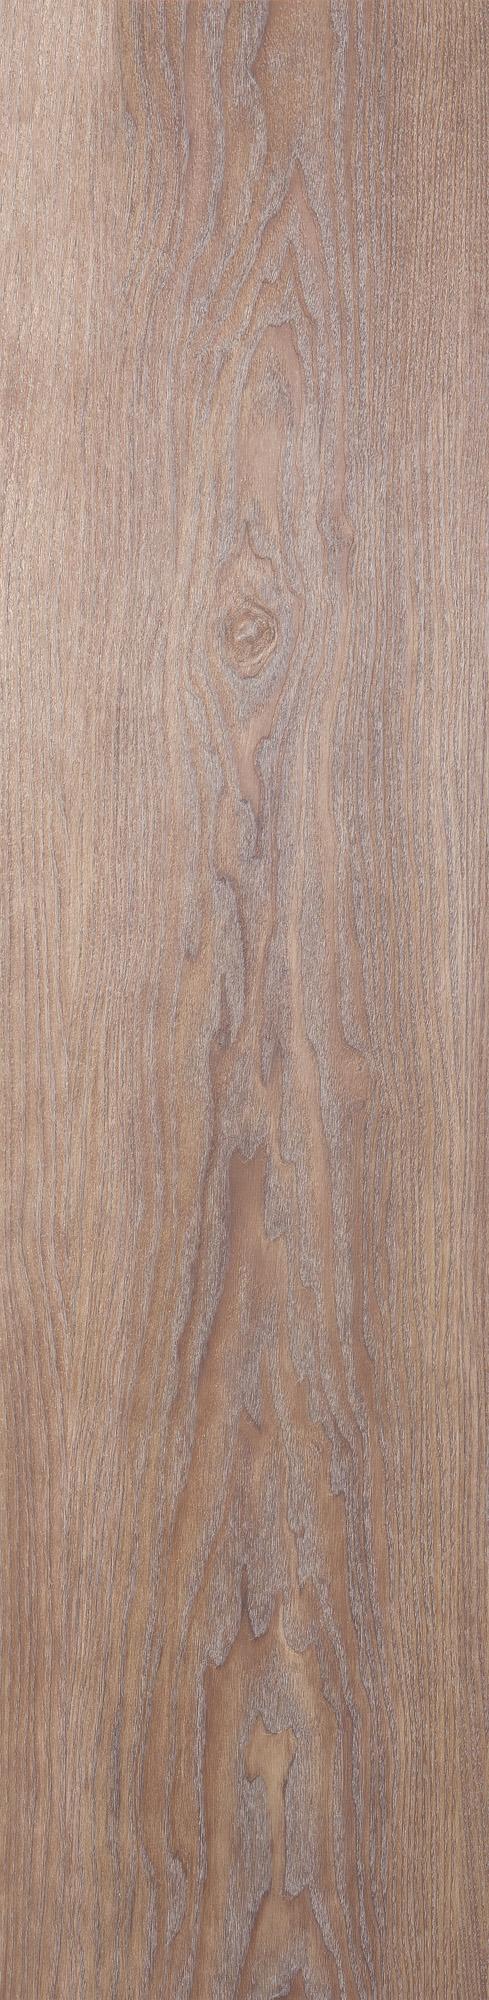 Chêne pédonculé chaux